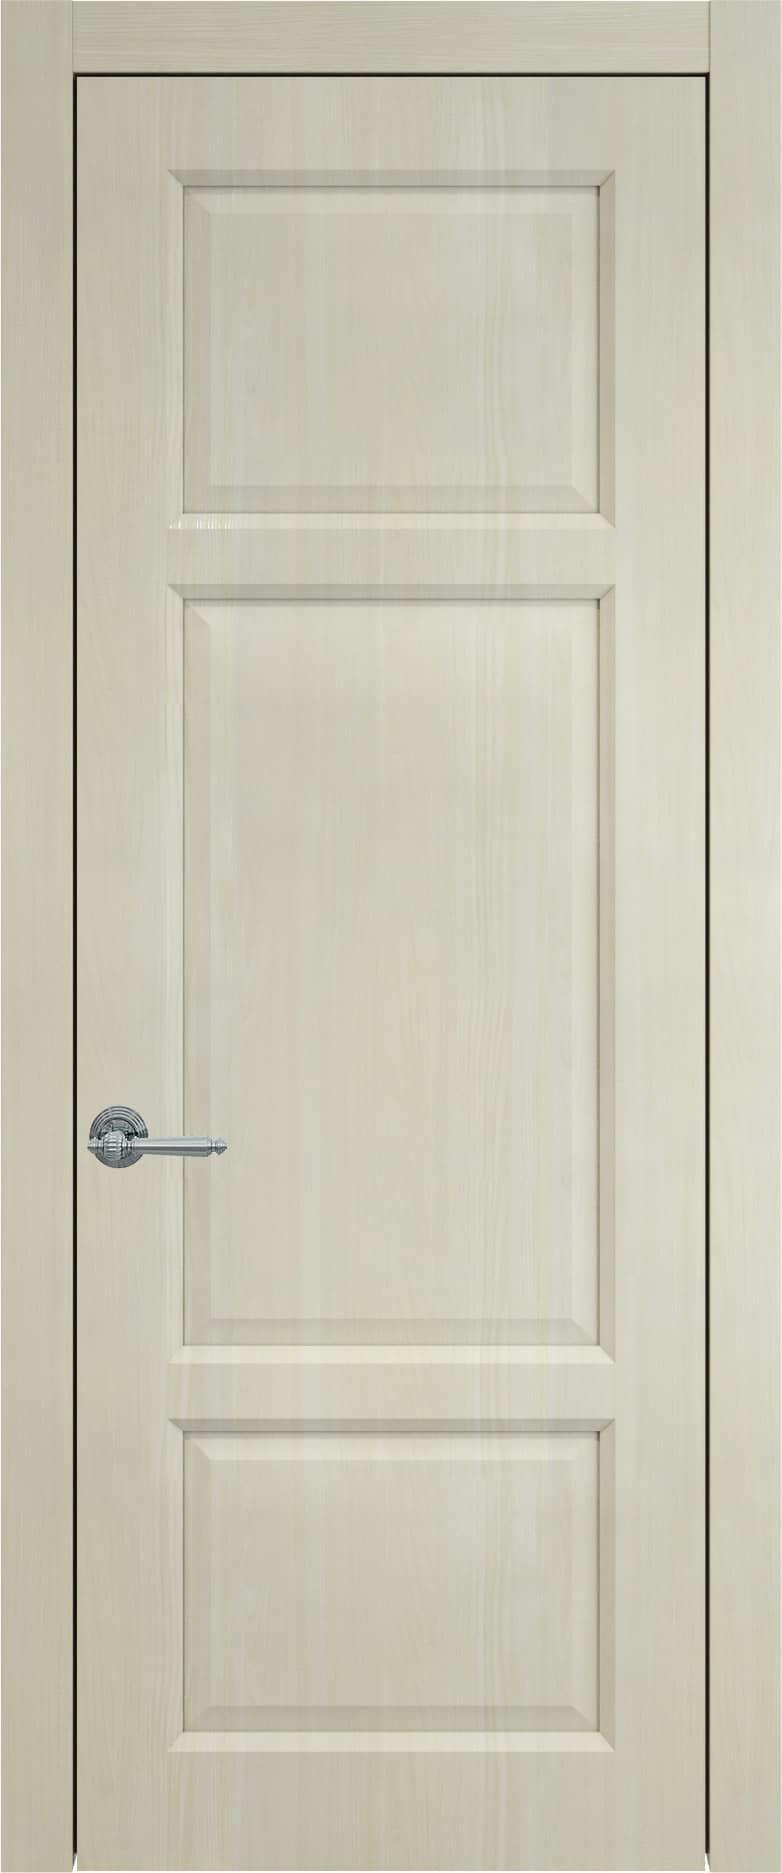 Siena цвет - Клен Без стекла (ДГ)